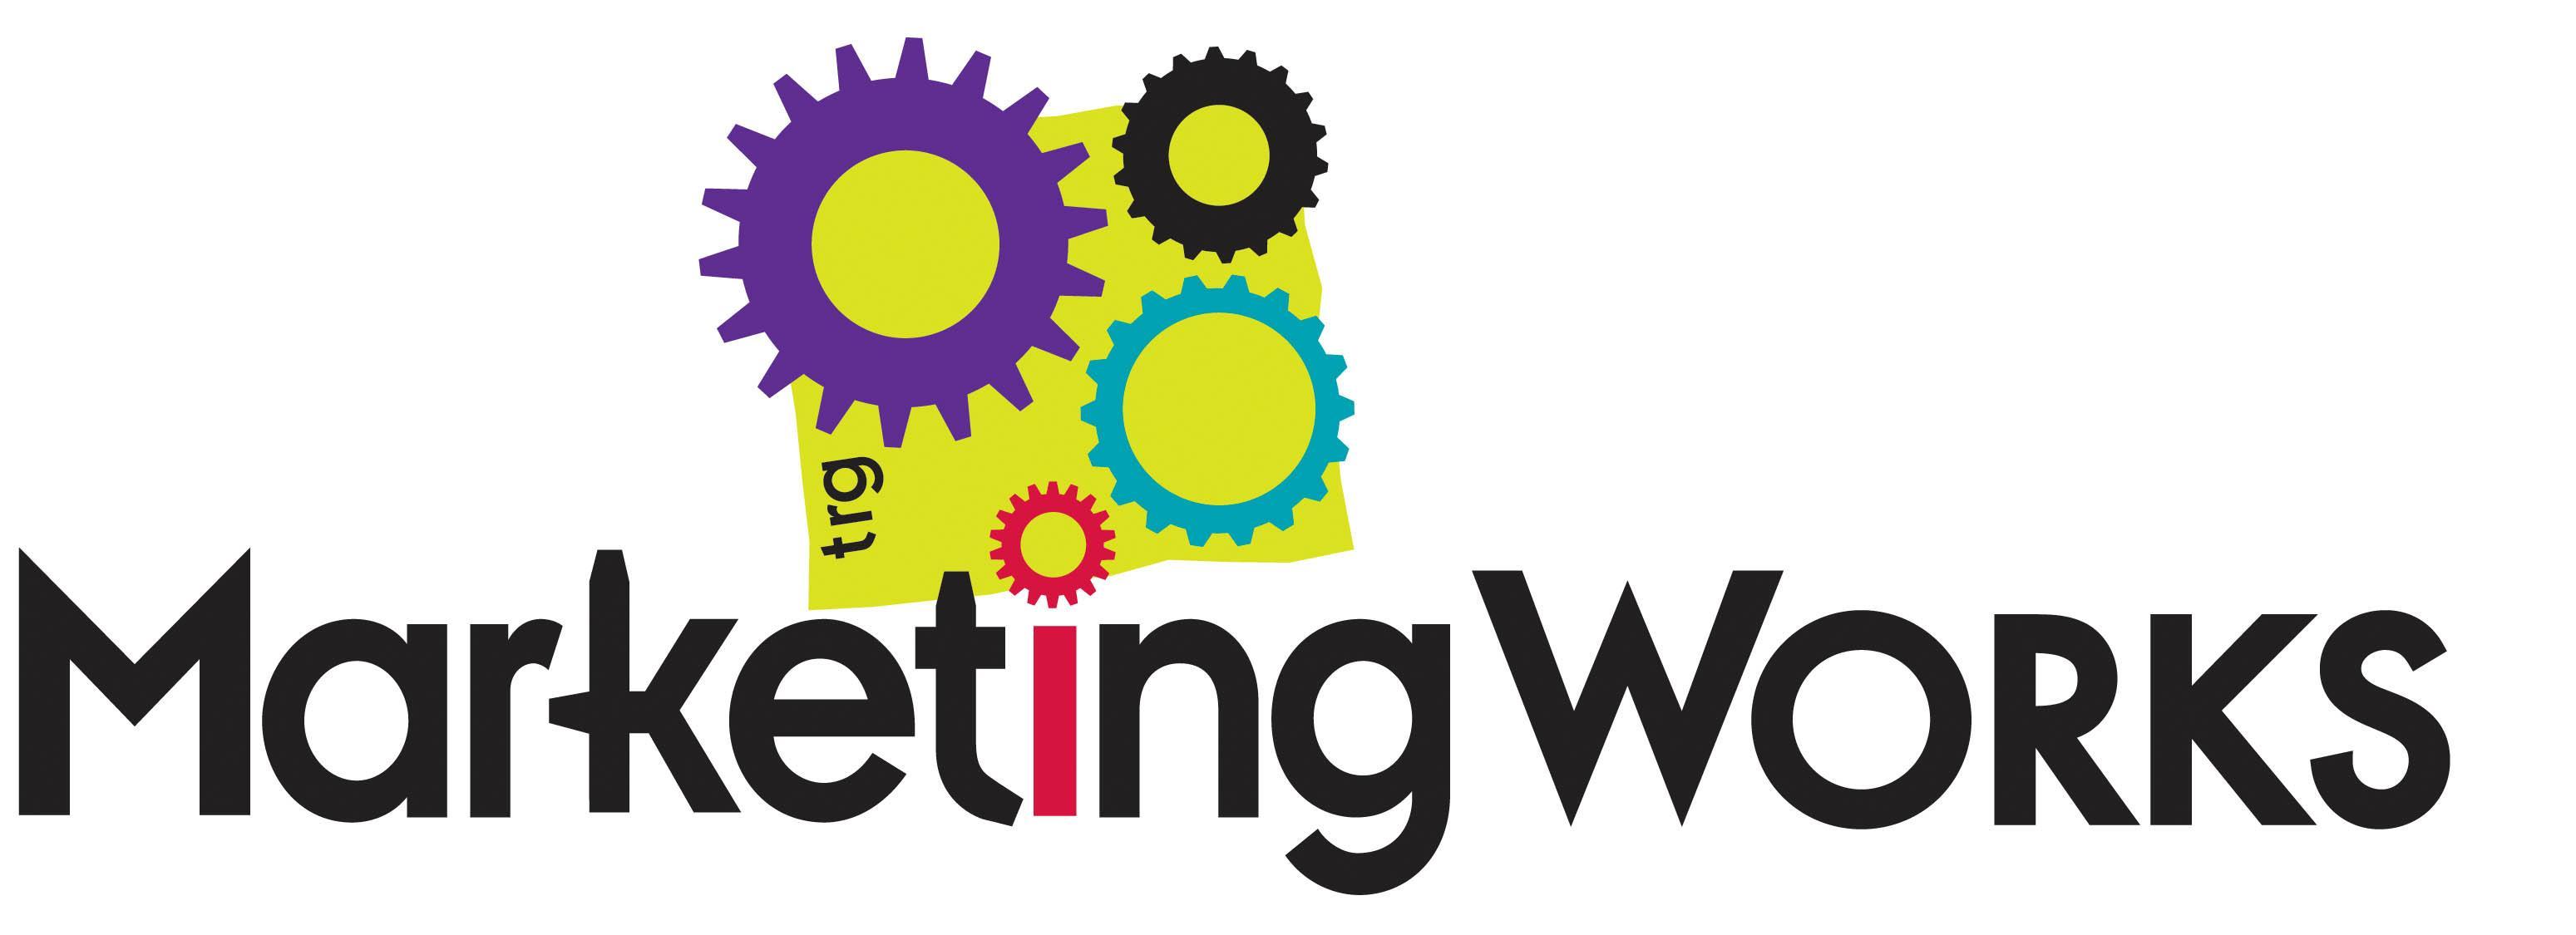 trg Marketing Works